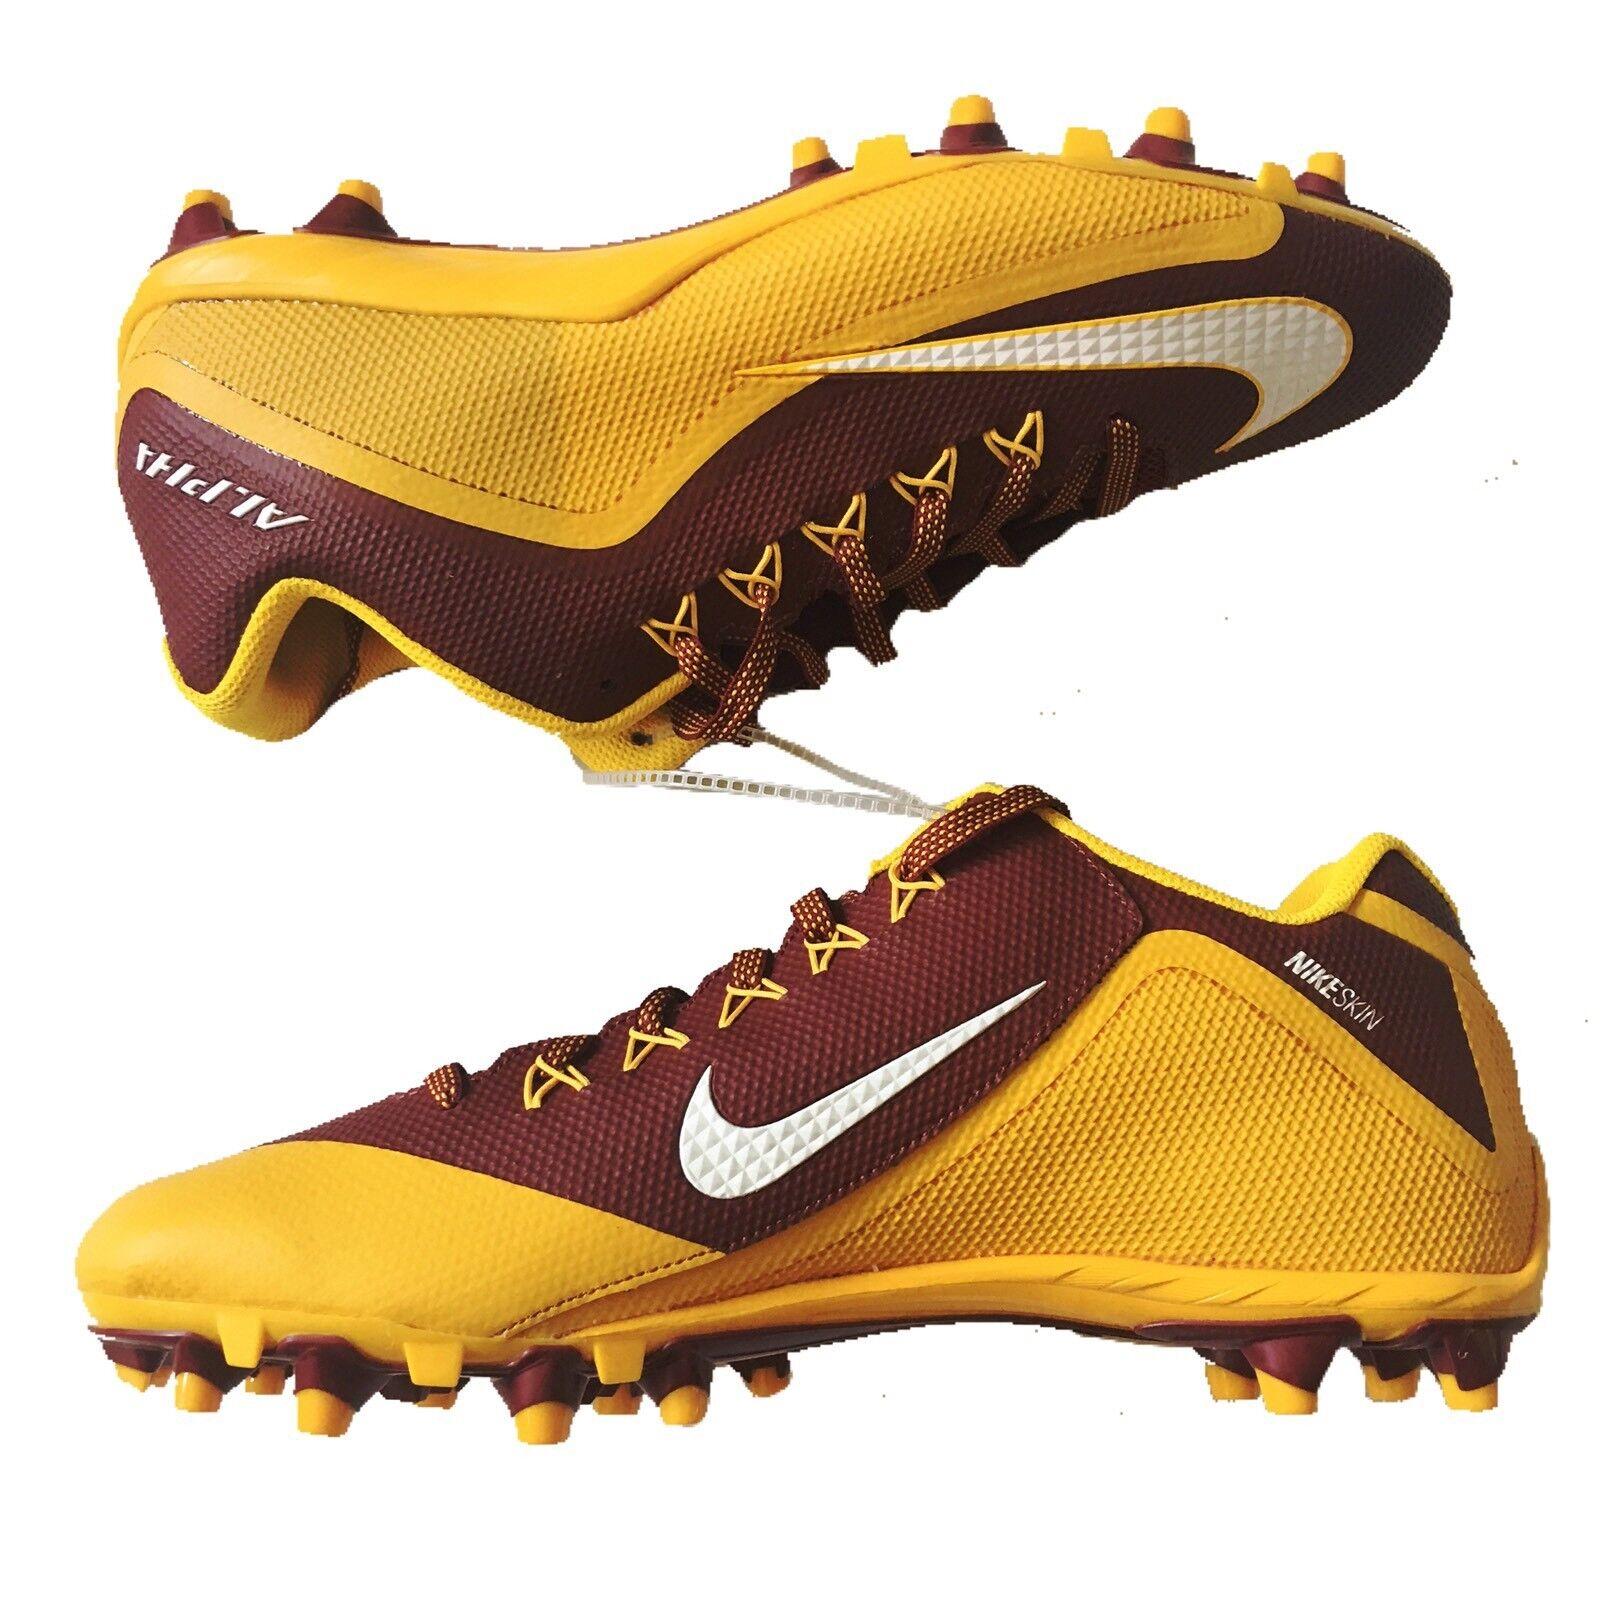 Nike Alpha Pro 2 II Low TD Strike Sz 13 Football Cleats shoes Maroon gold White